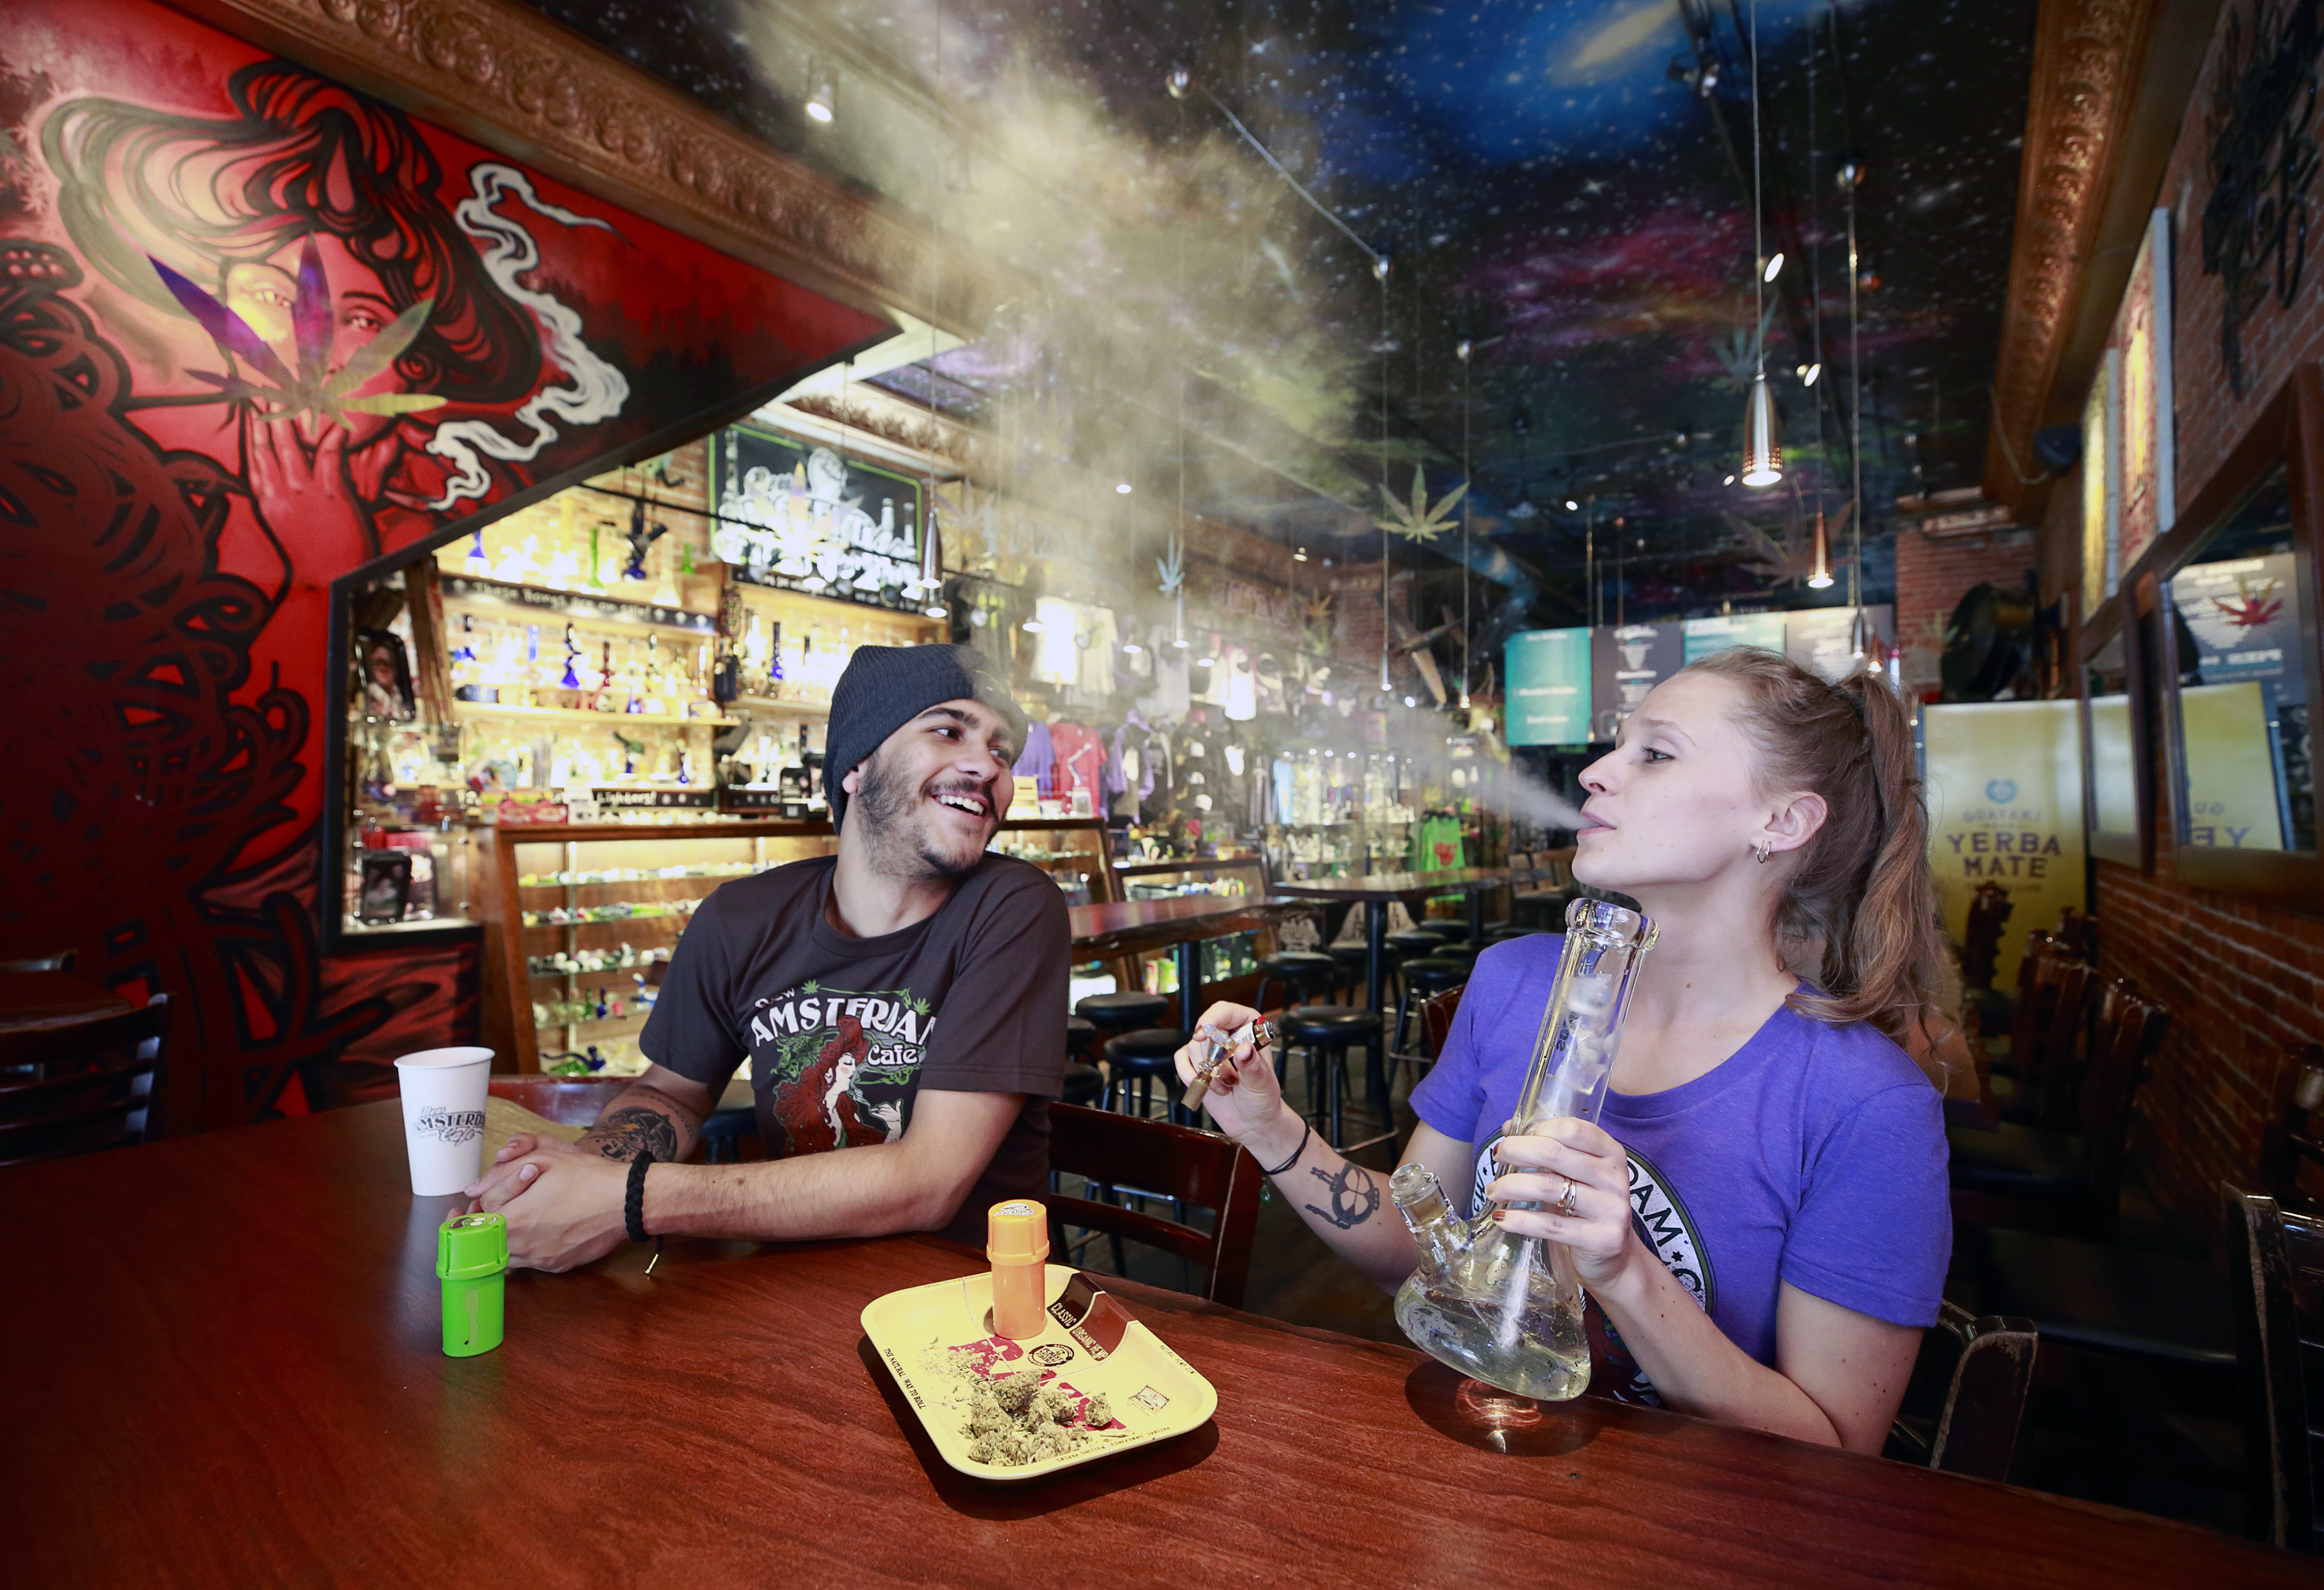 Rodrigo Acevedo Casino looks on as Anna Bolechowska smokes marijuana with a bong at the New Amsterdam Cafe June 20, 2018 in Vancouver, British Columbia, Canada. Jeff Vinnick/Getty Images